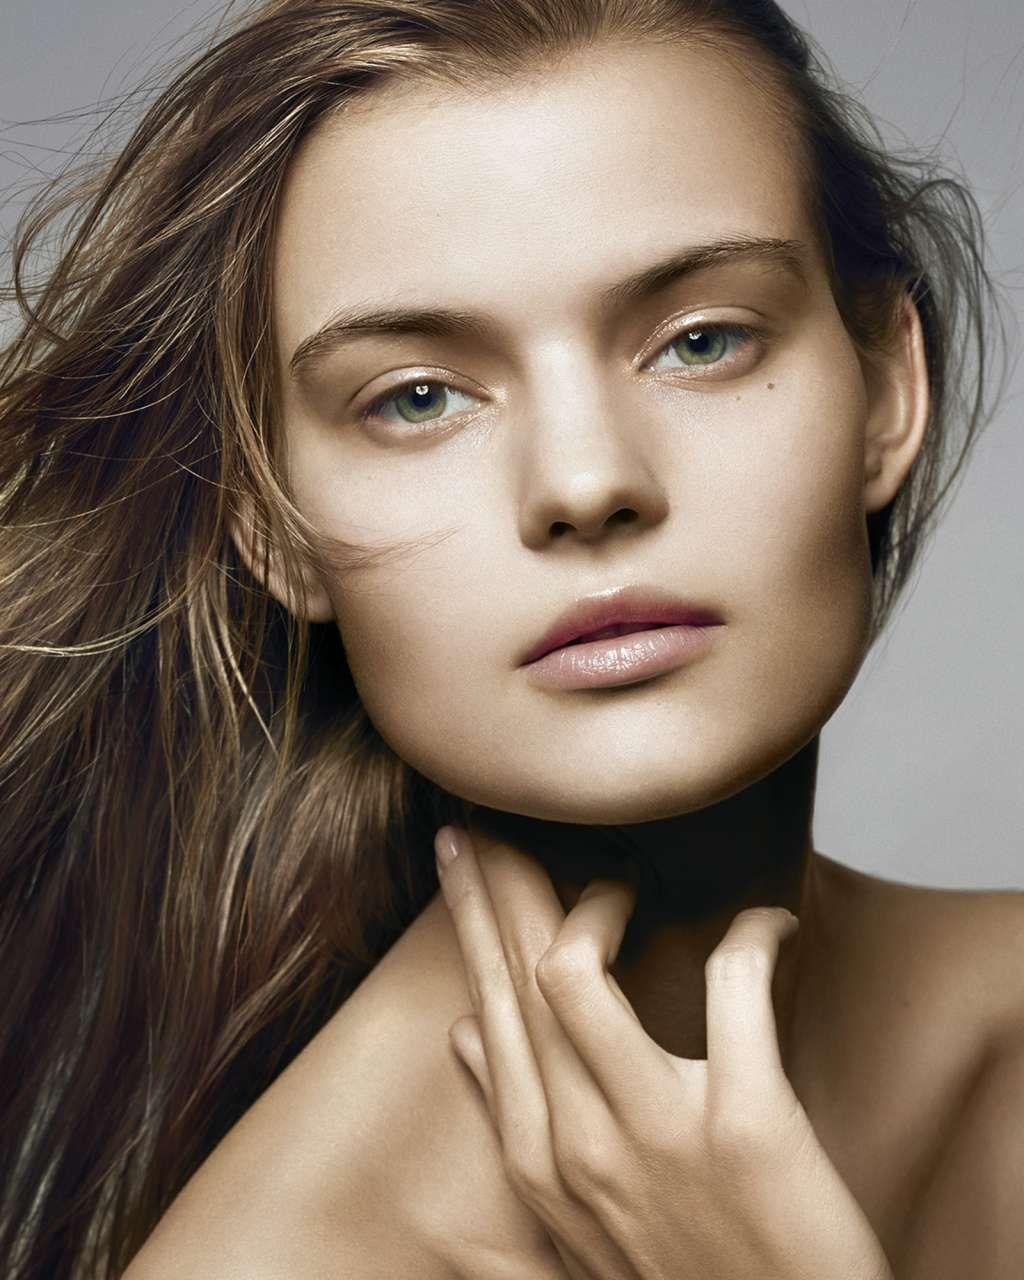 Hottest Kate Grigorieva Photos